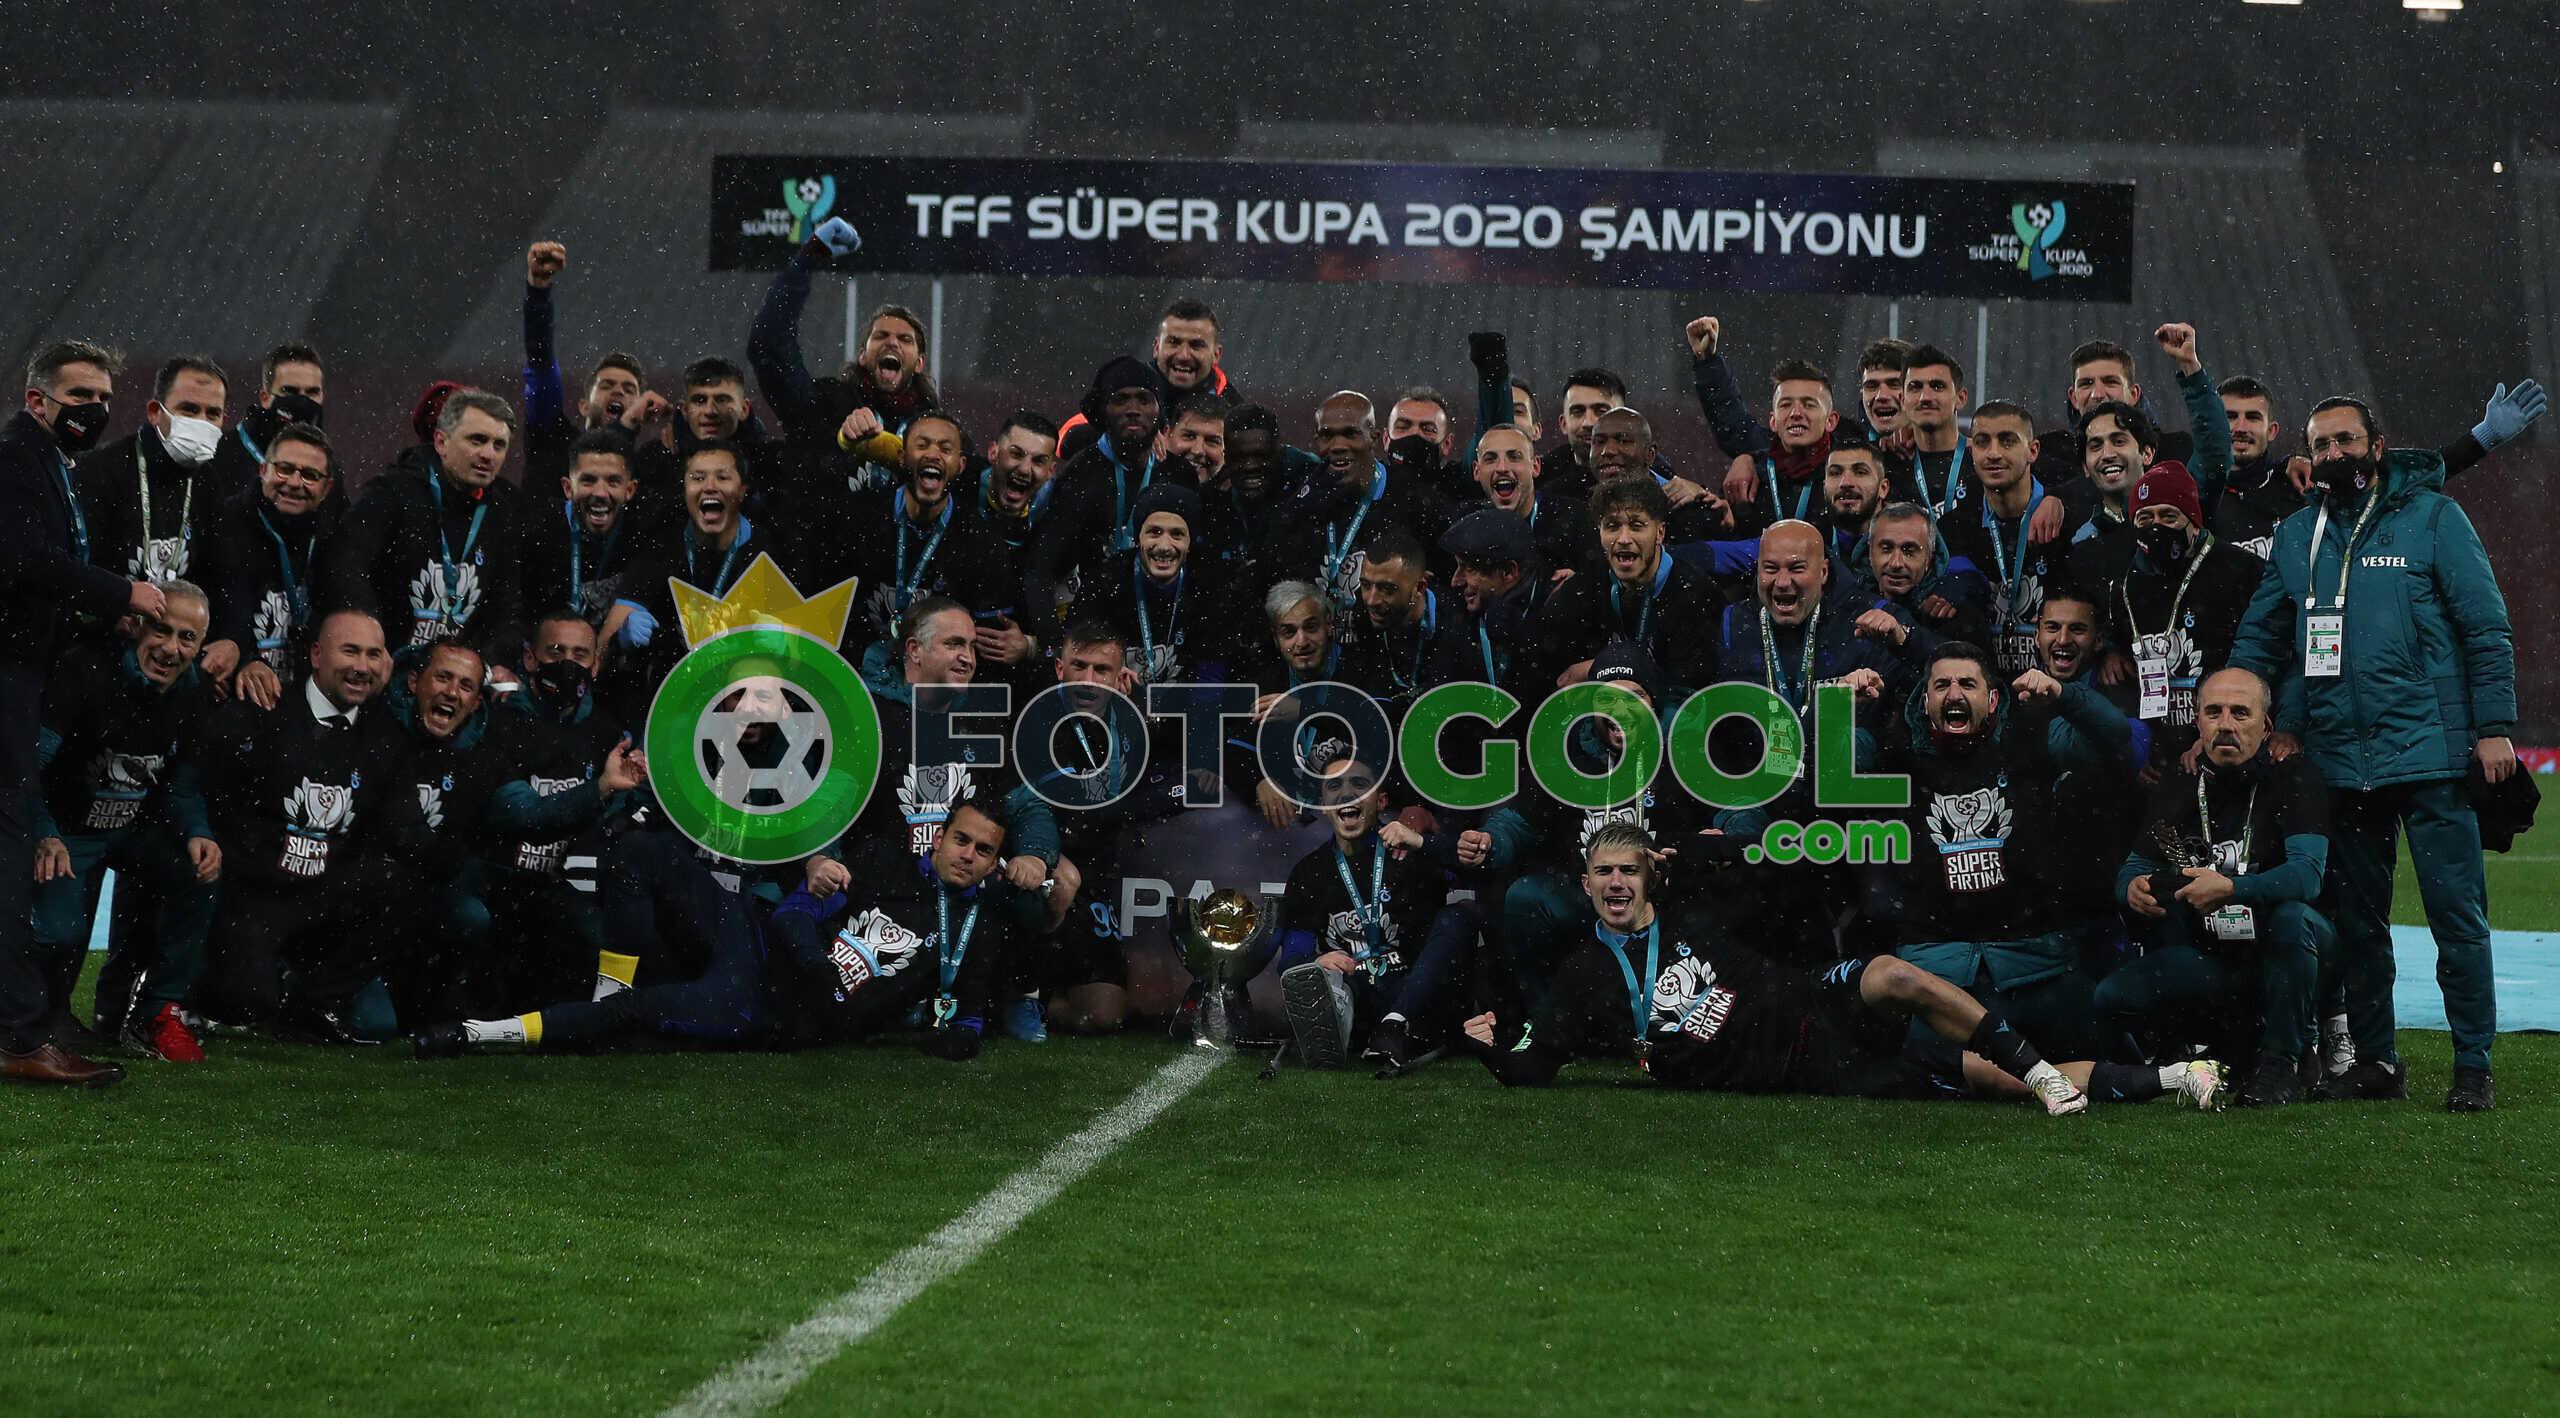 Trabzon Süper kupanın sahibi  2-1